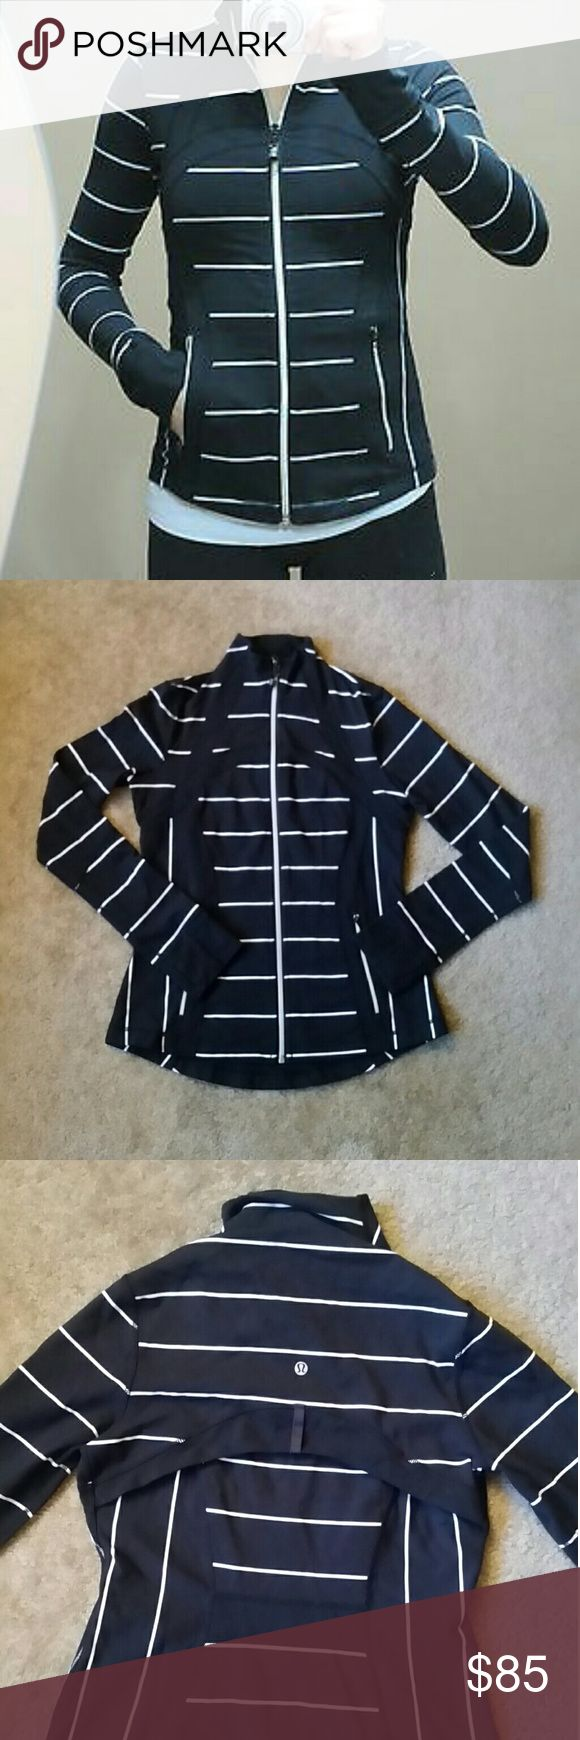 15 must see define posh pins posh definition chloe brown and lululemon sailor stripe define jacket rare